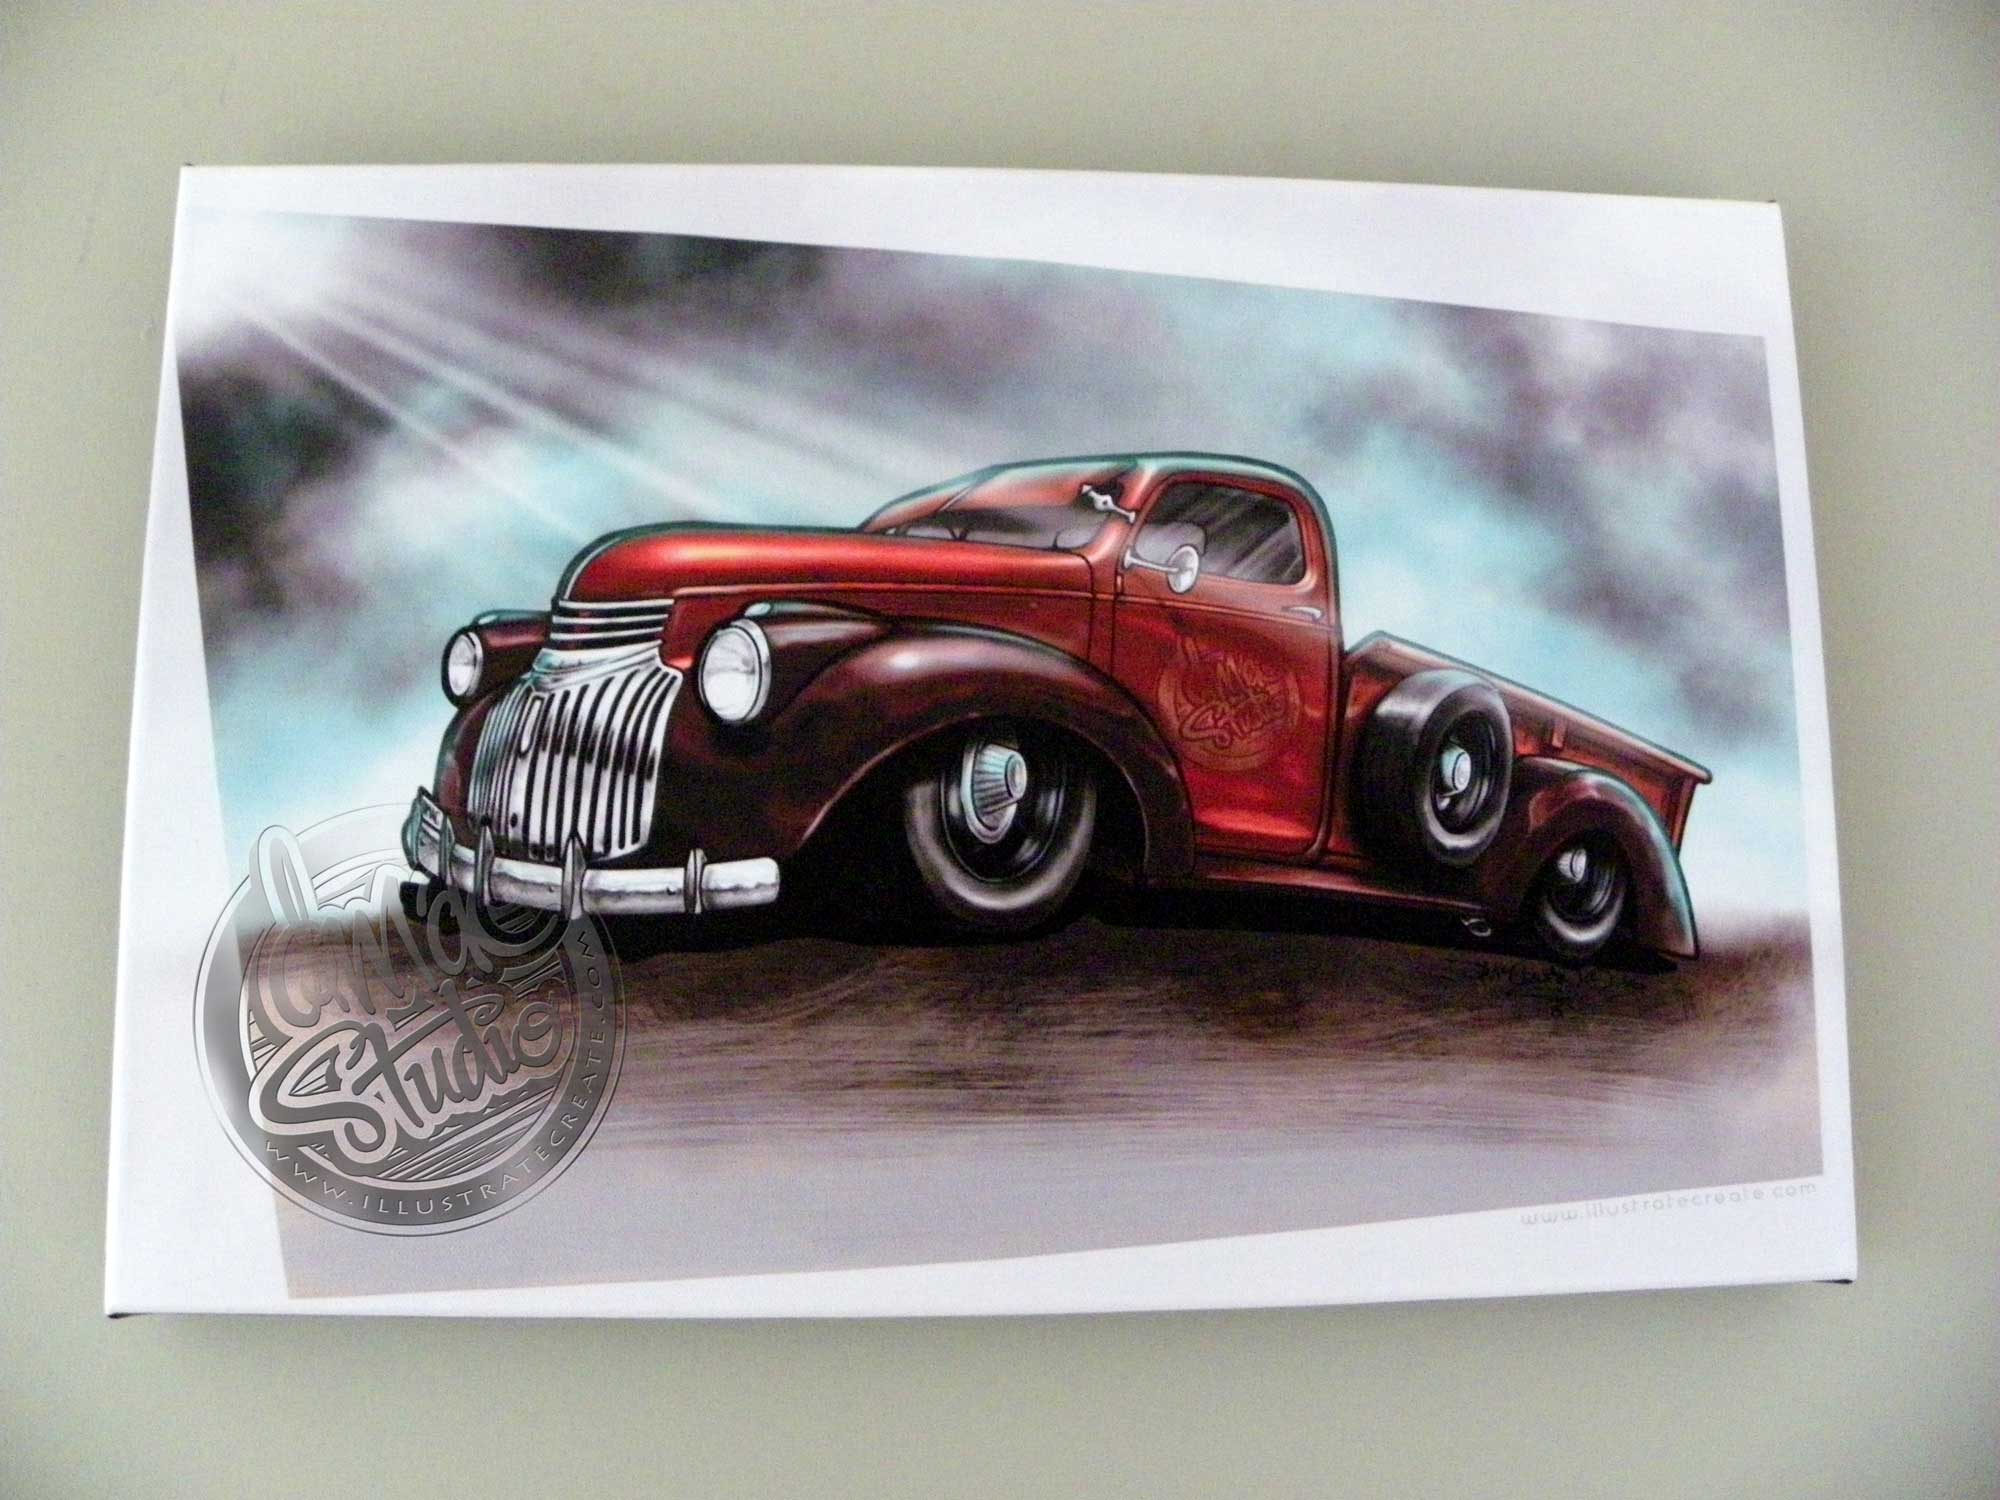 1946 Chevrolet Pick Up Art Print #2 - DMAC Studio, Illustrate Create